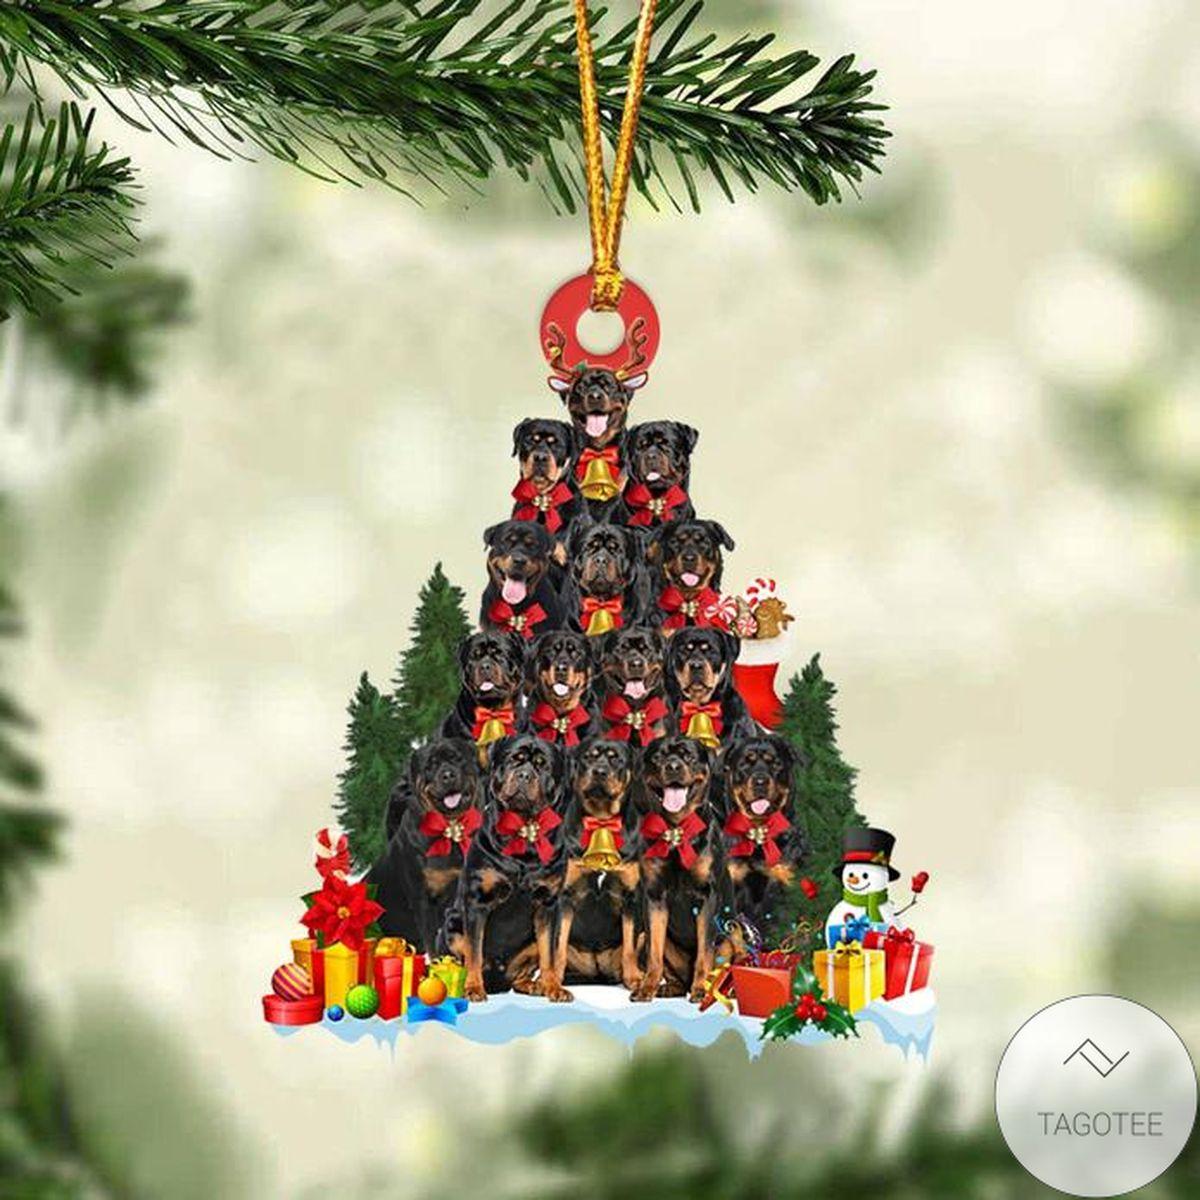 Rottweiler Dog Christmas Tree Ornament